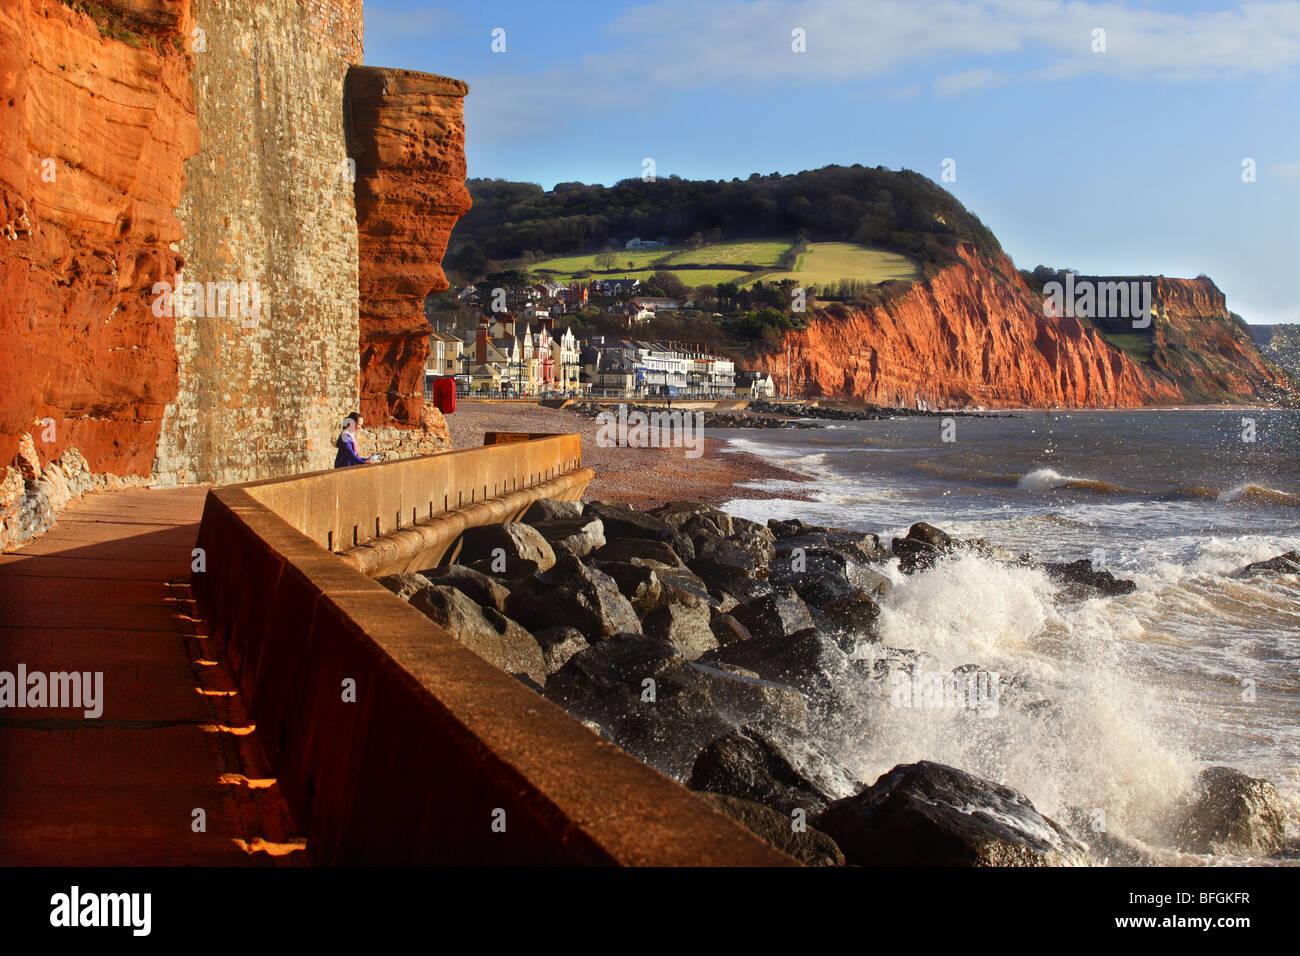 Sidmouth, Devon, England. - Stock Image